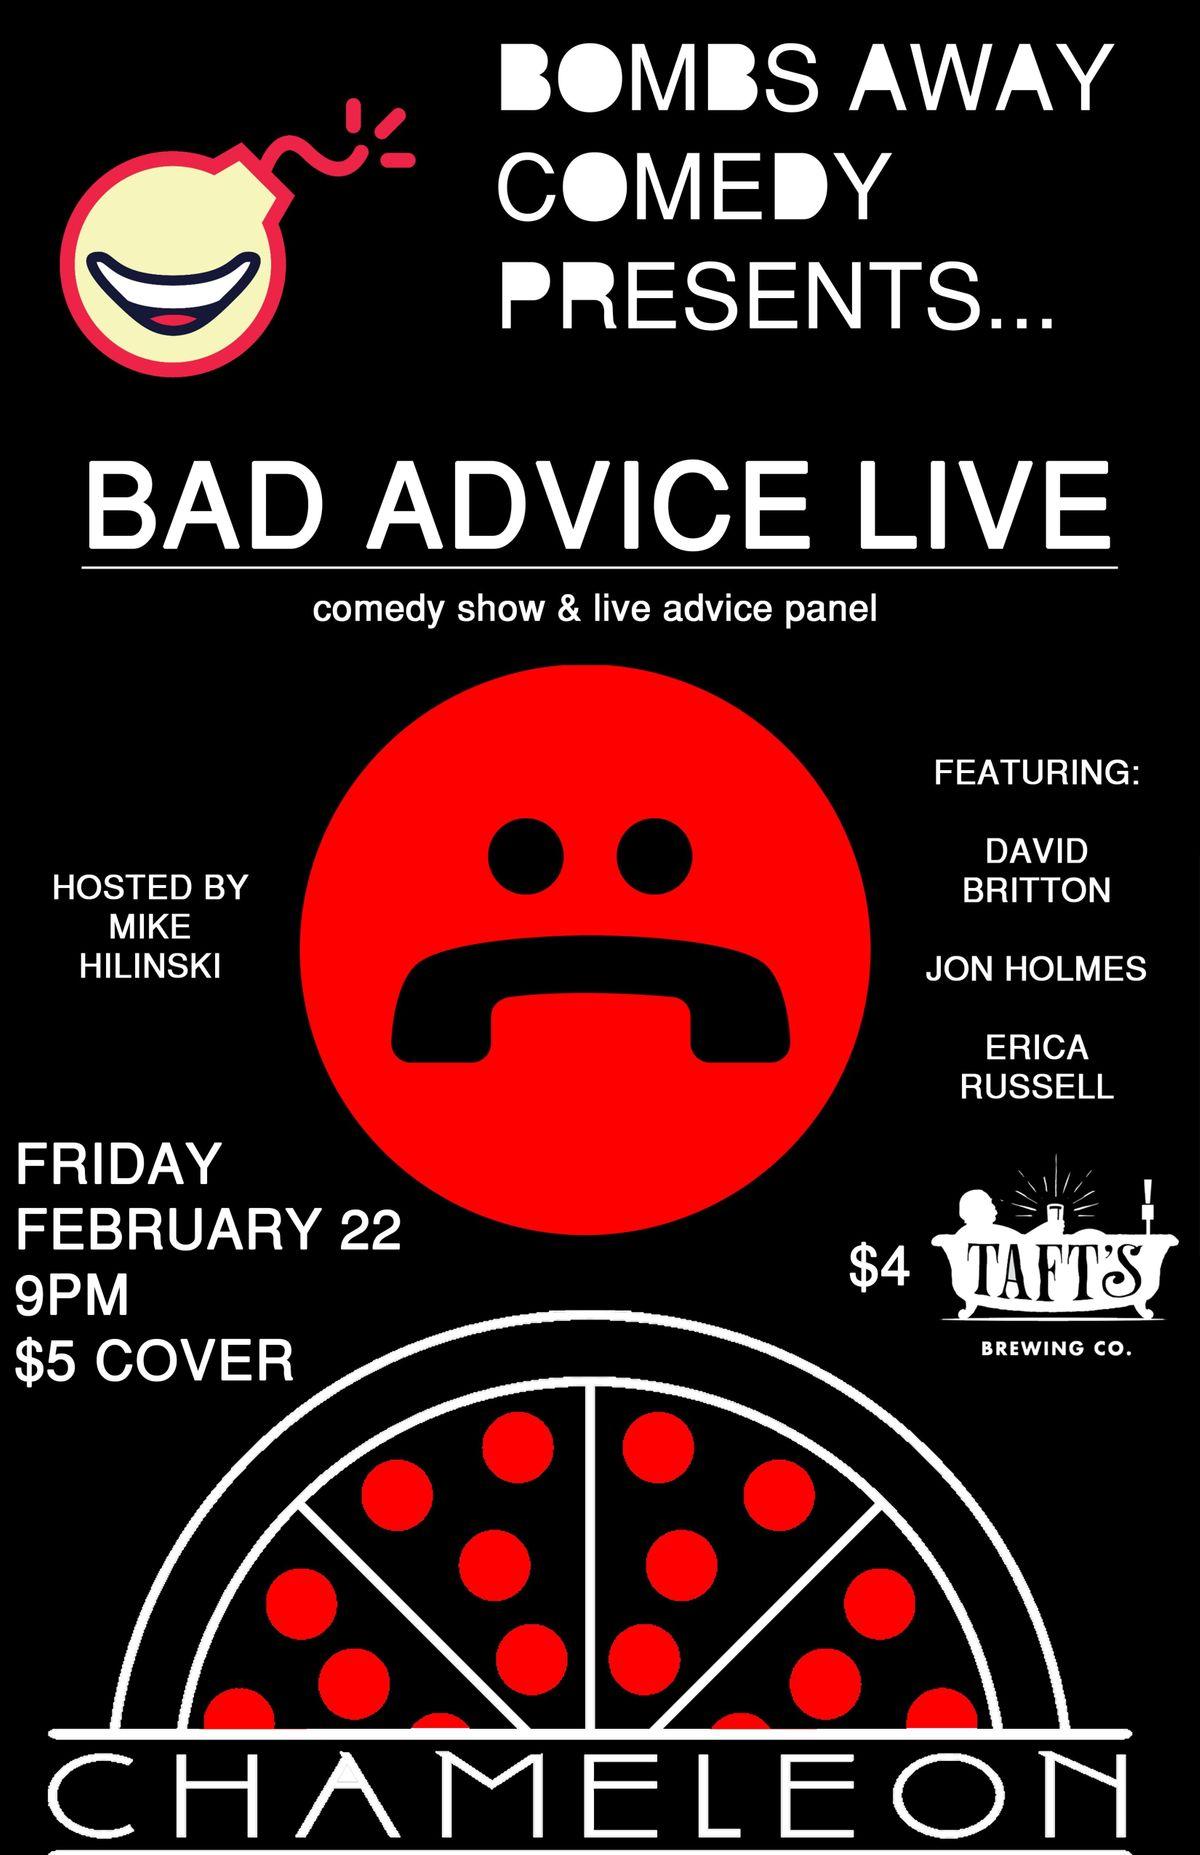 Bad Advice Live